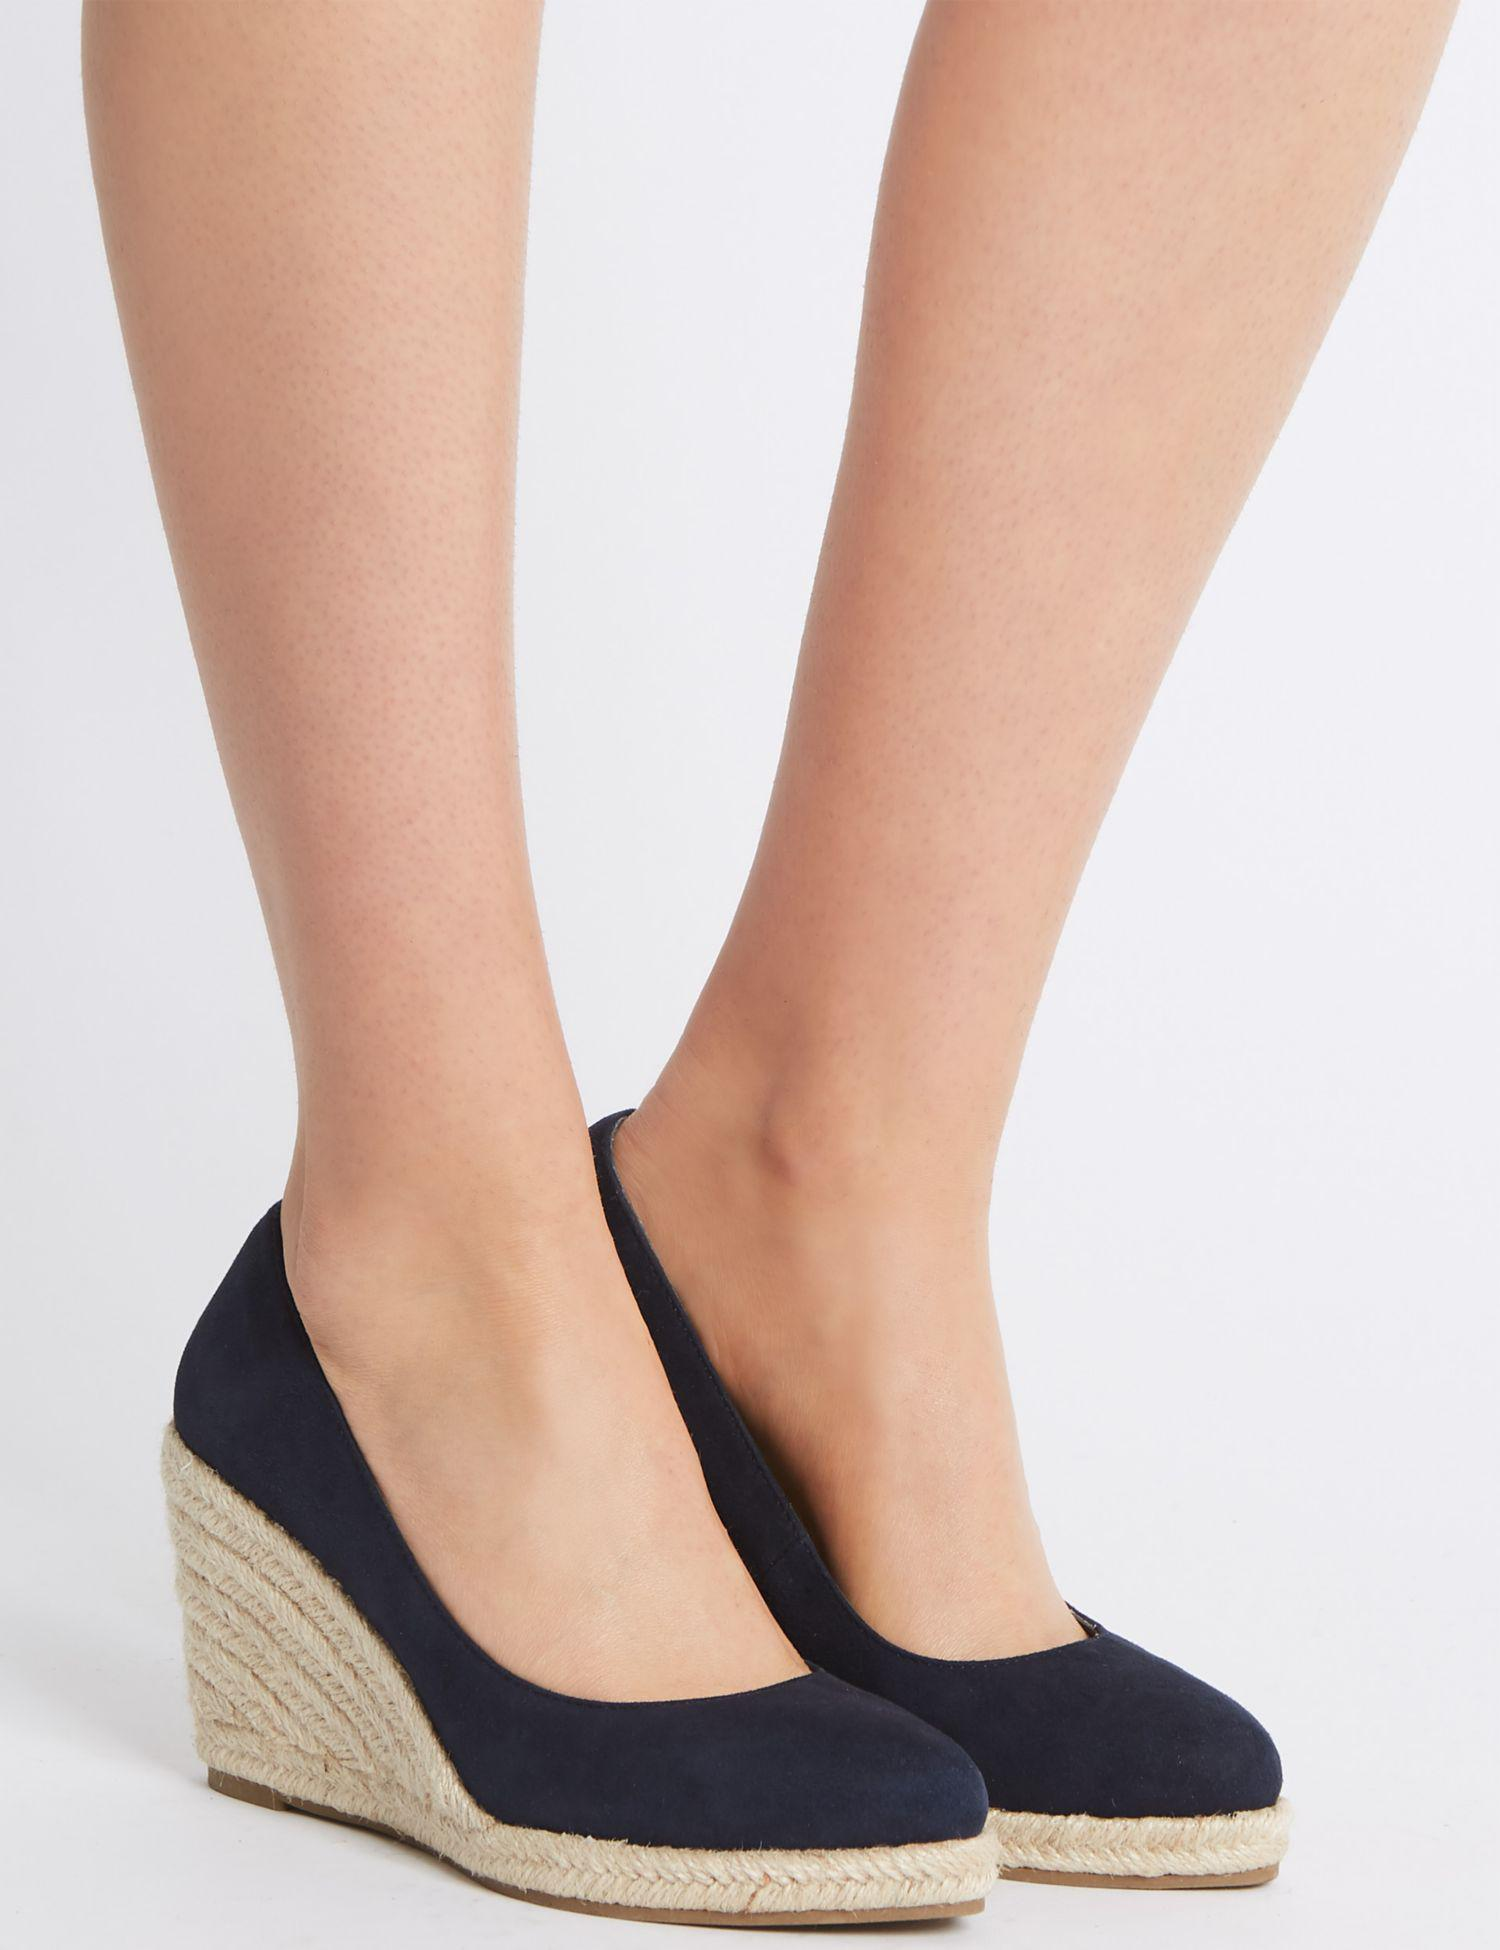 1897e9b1ca0306 ... Almond Toe Wedge Heel Espadrilles in Blue - Lyst great fit 33f9c 7cdf6   Lyst - Isaac Mizrahi New York Bling Jewel-Detail Platform Wedge Leather  Sandals ...